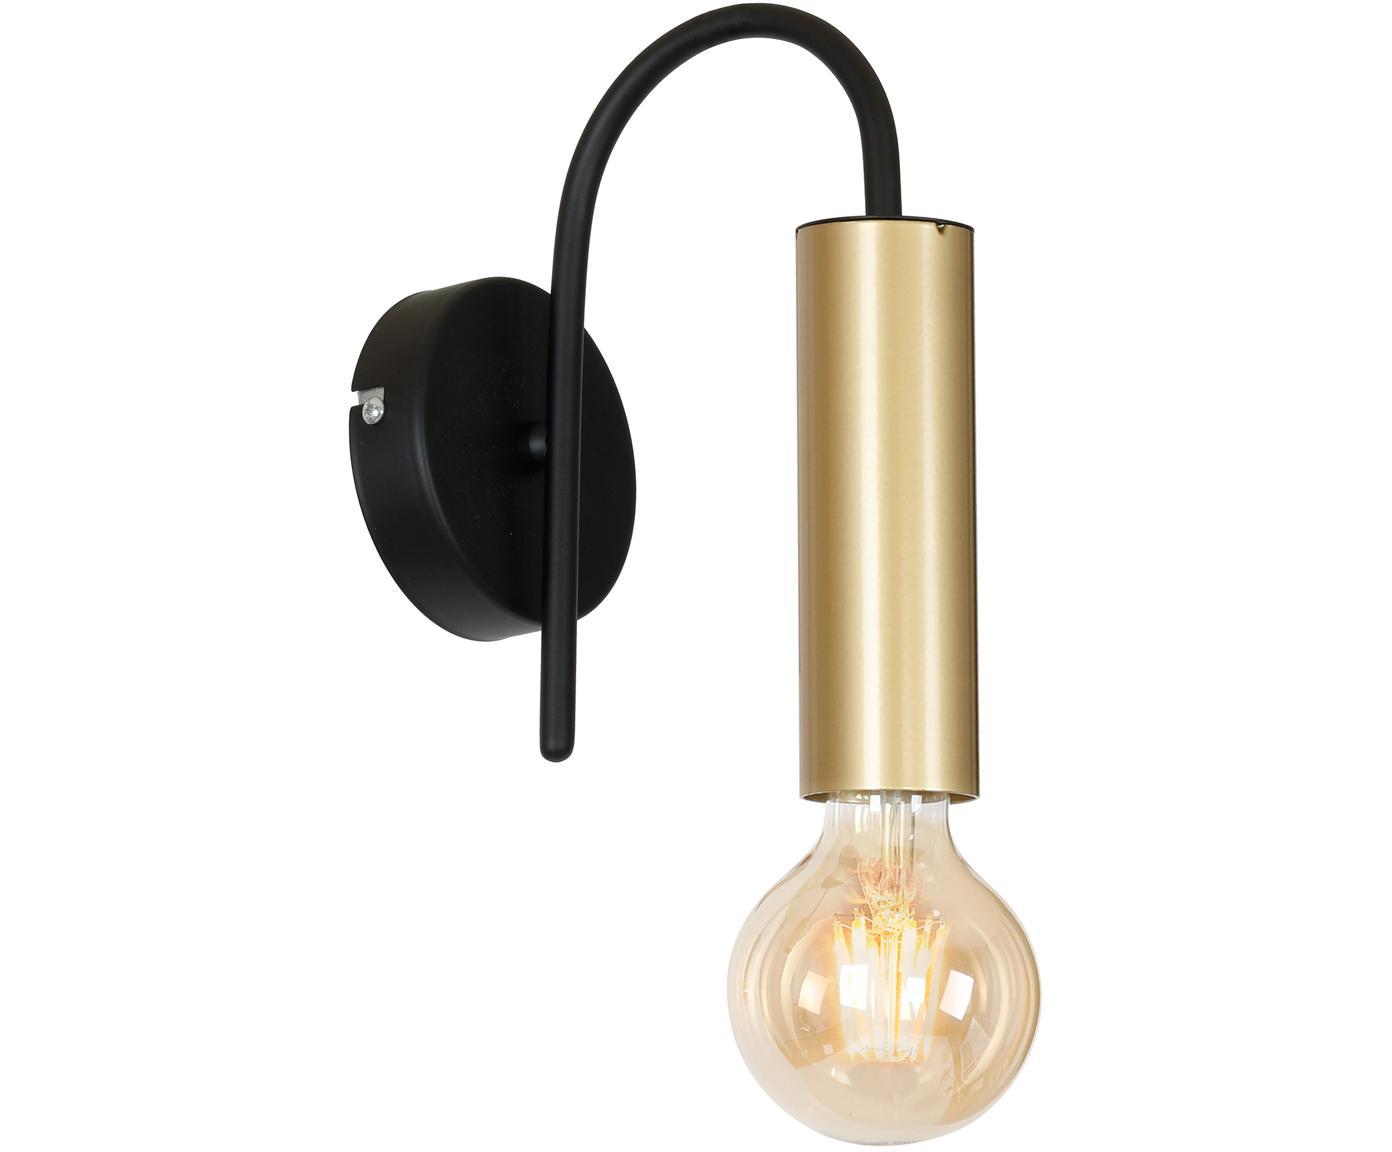 Wandlamp Loppe, Gelakt metaal, Messingkleurig, zwart, 10 x 21 cm